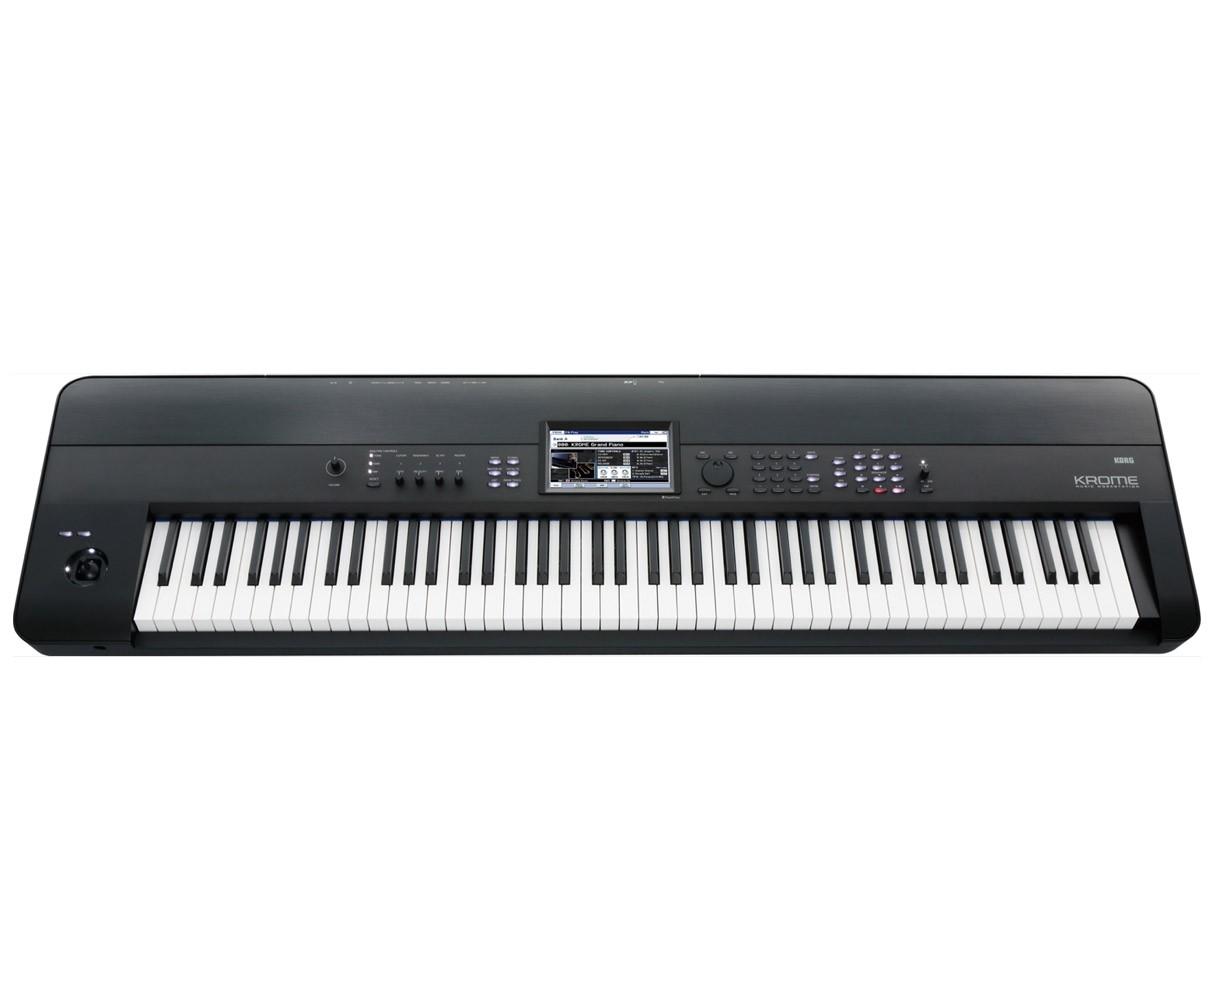 Krome 88 88-key Workstation - Used